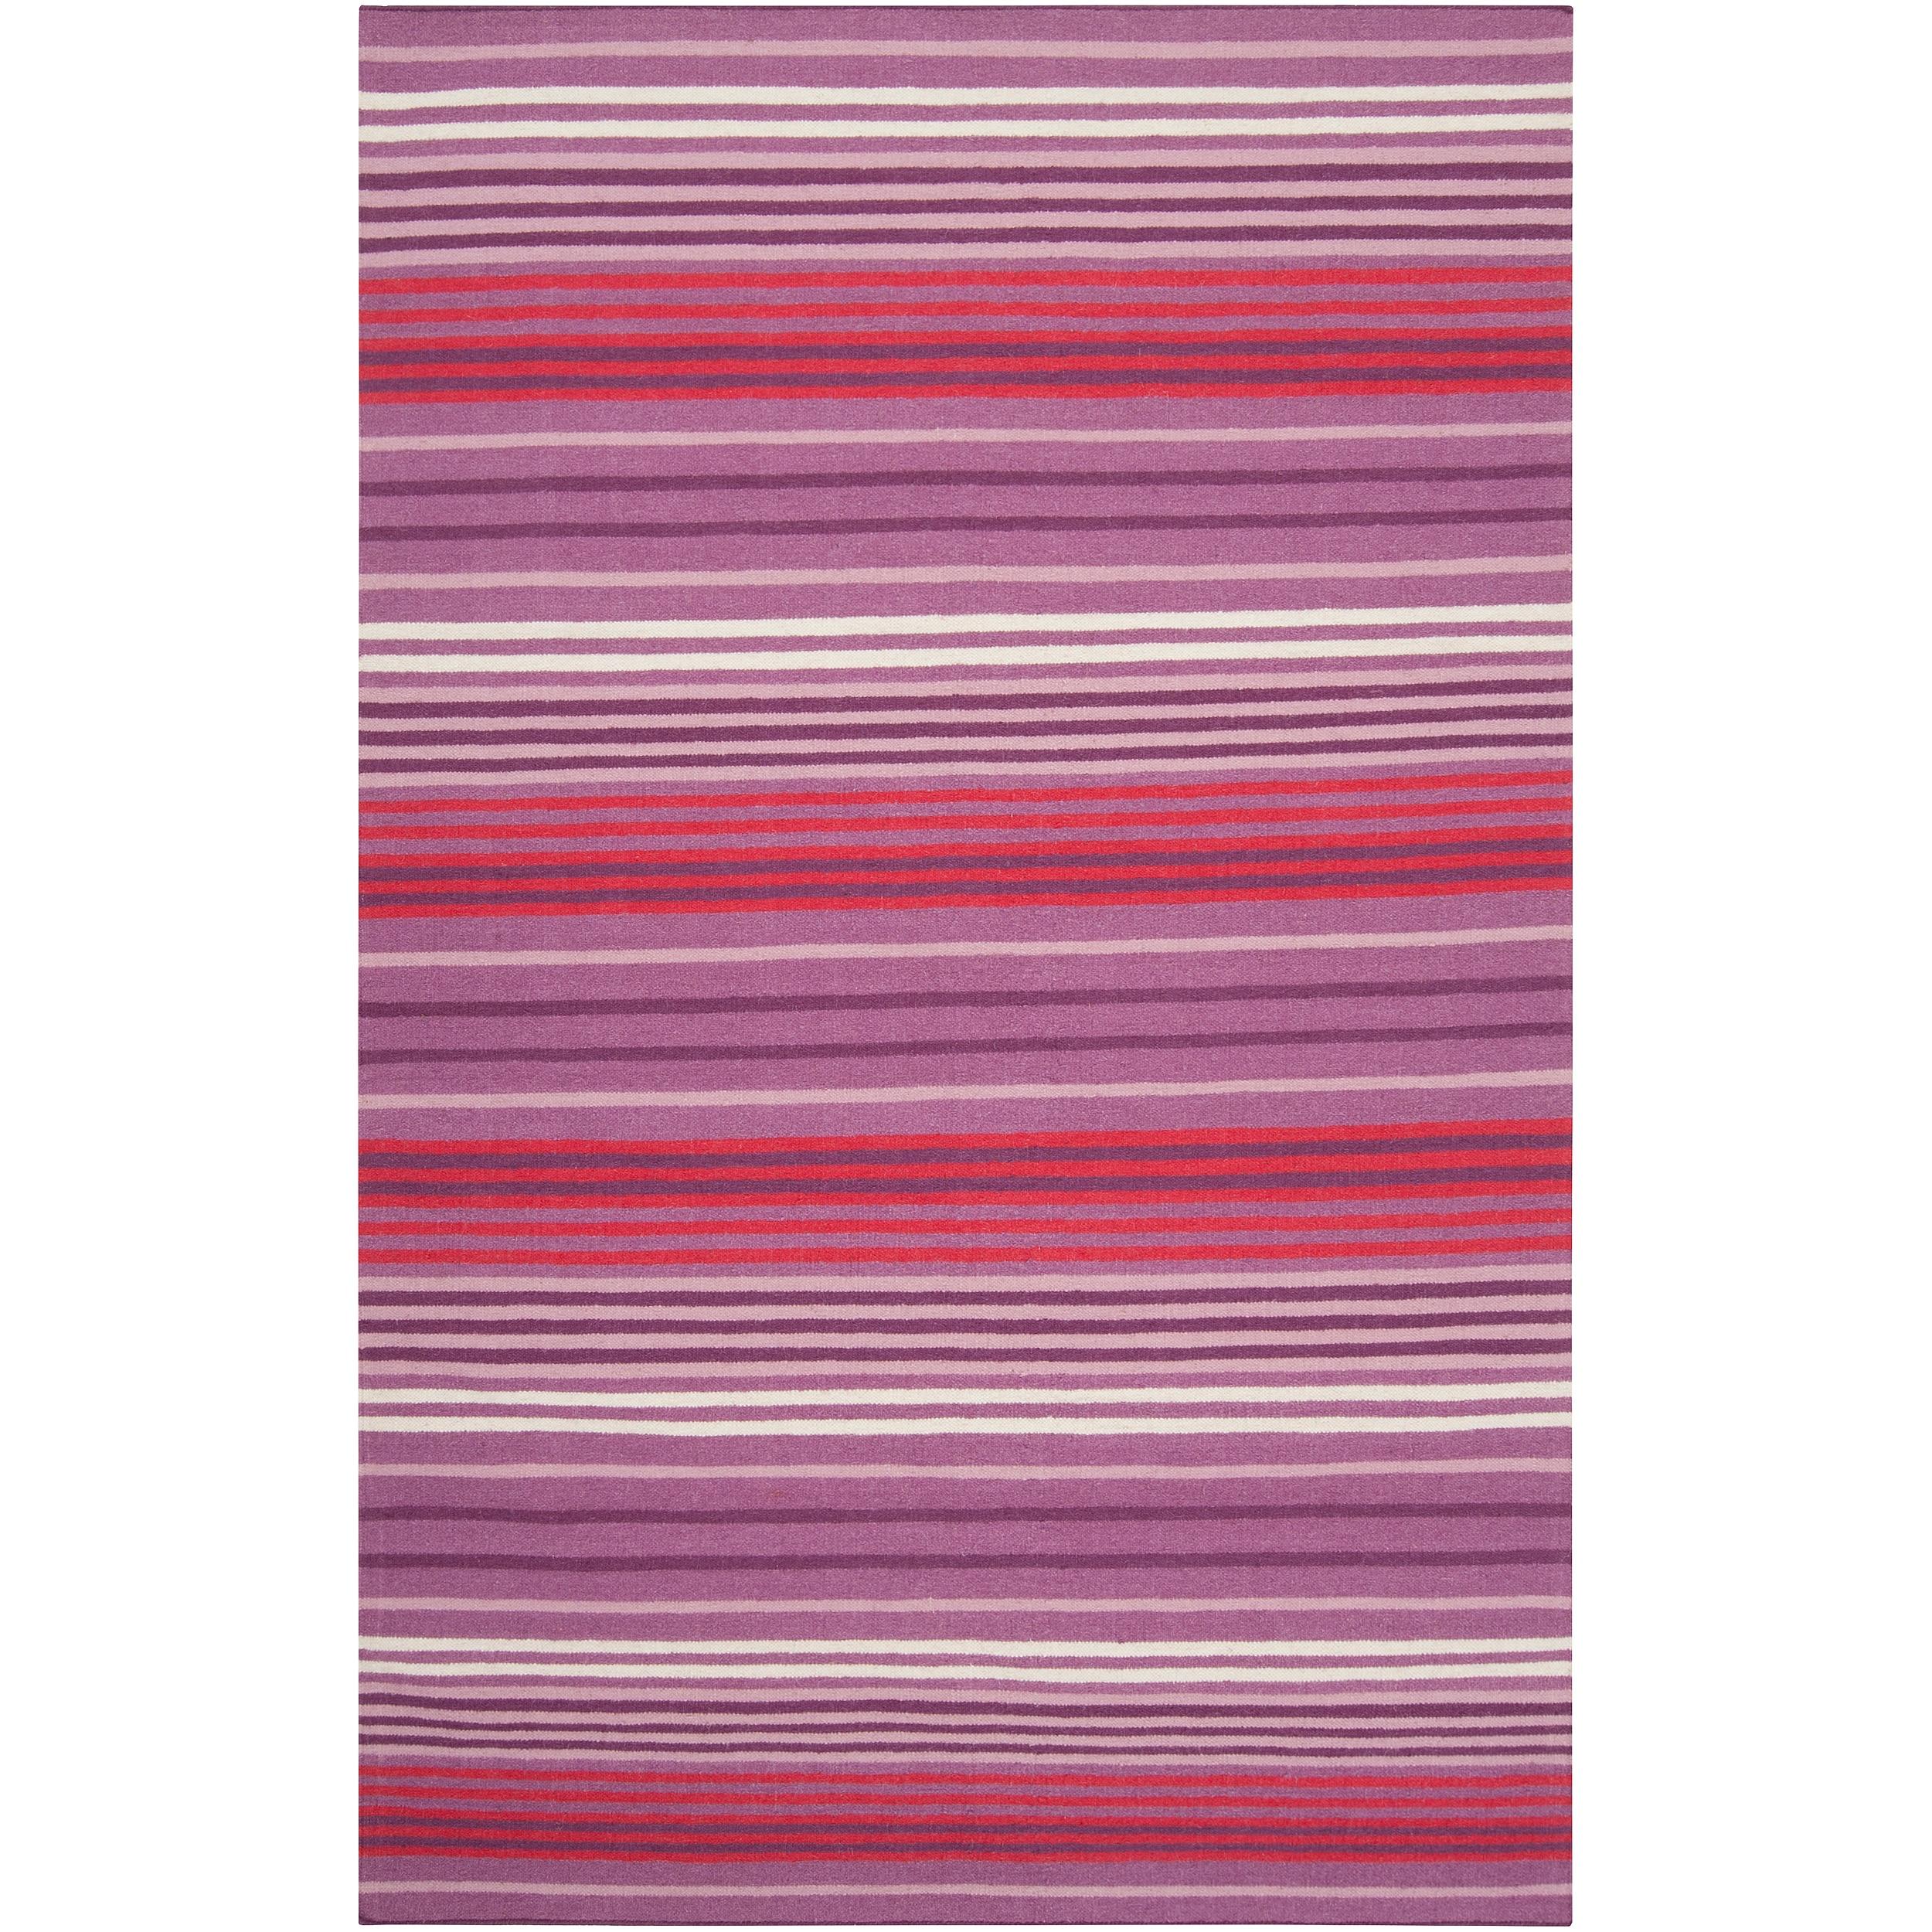 Country Living Hand-woven Purple High Kite Wool Rug (8' x 11')